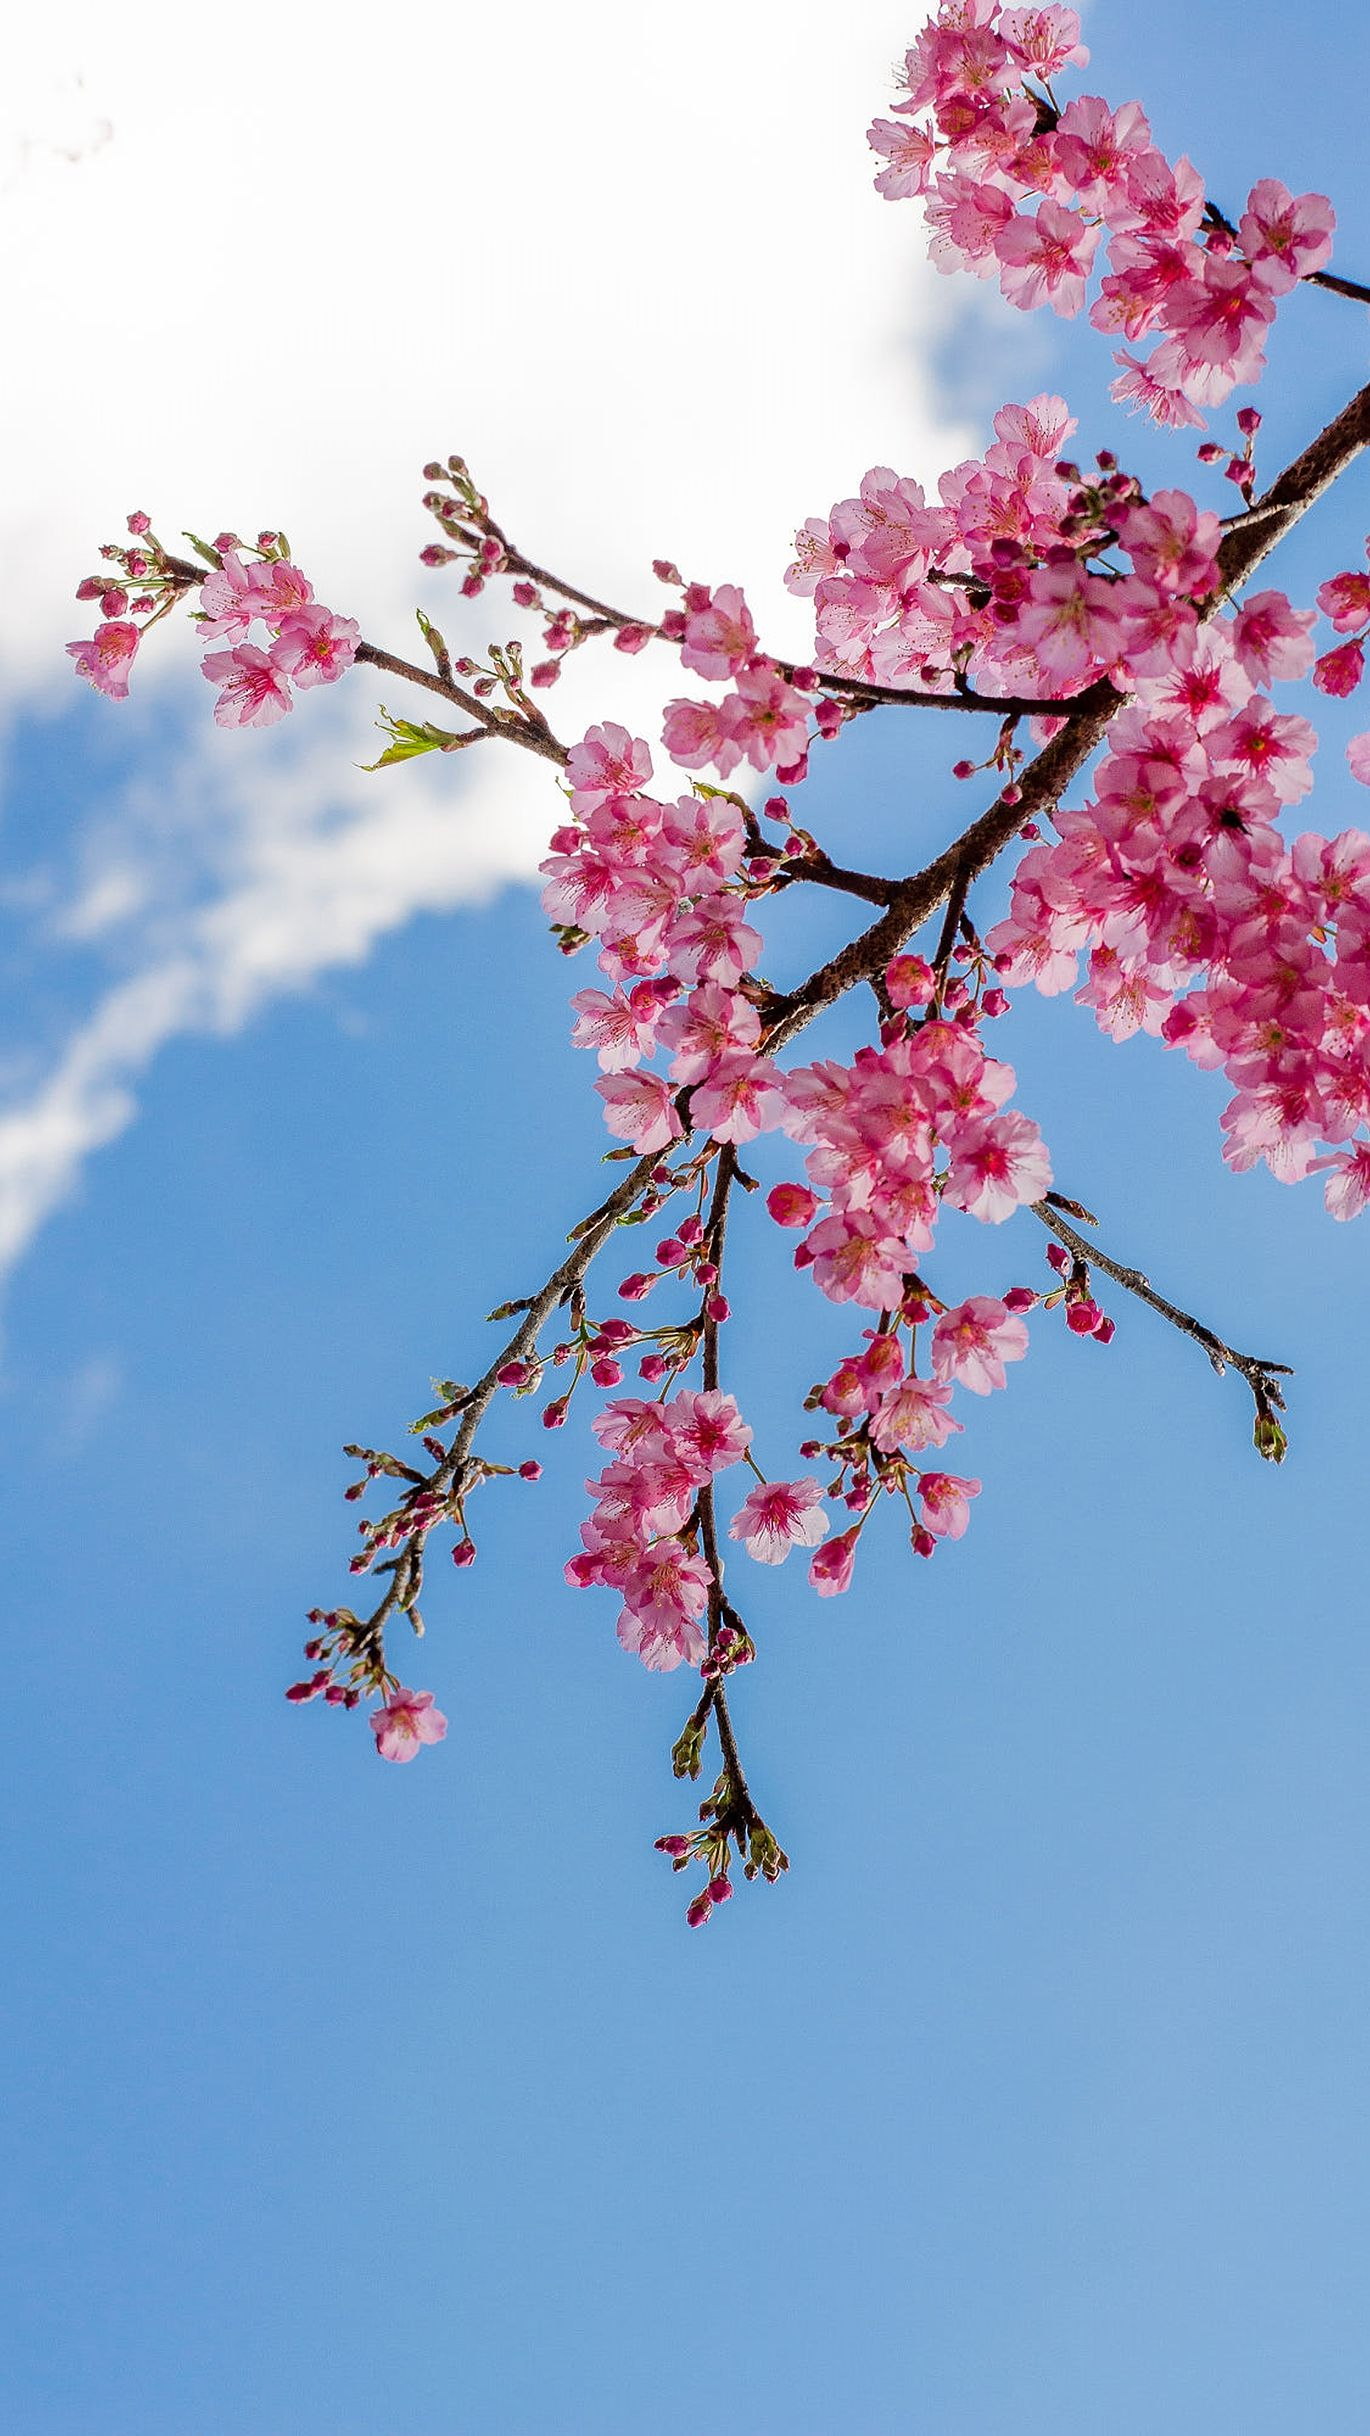 Branch Of Flowers Cherry Blossom Wallpaper Sky Aesthetic Cute Flower Wallpapers